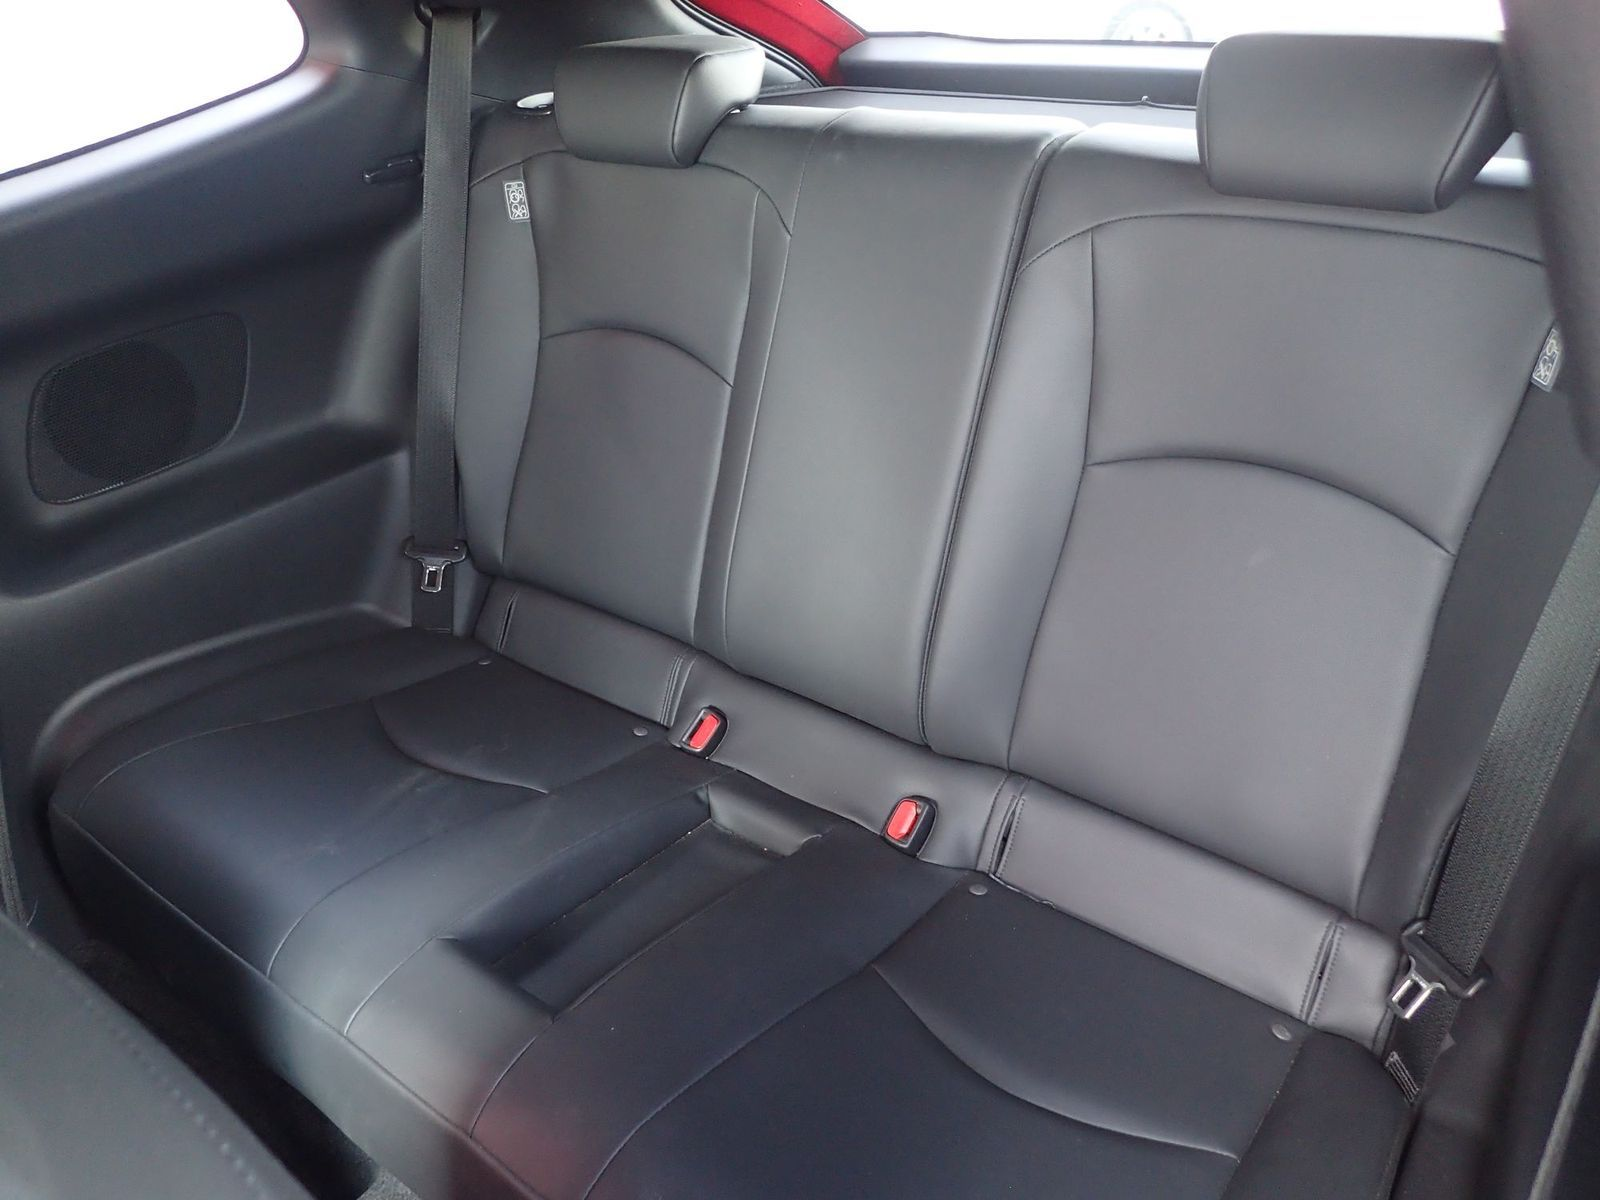 ToyotaYarisGR_2021_05